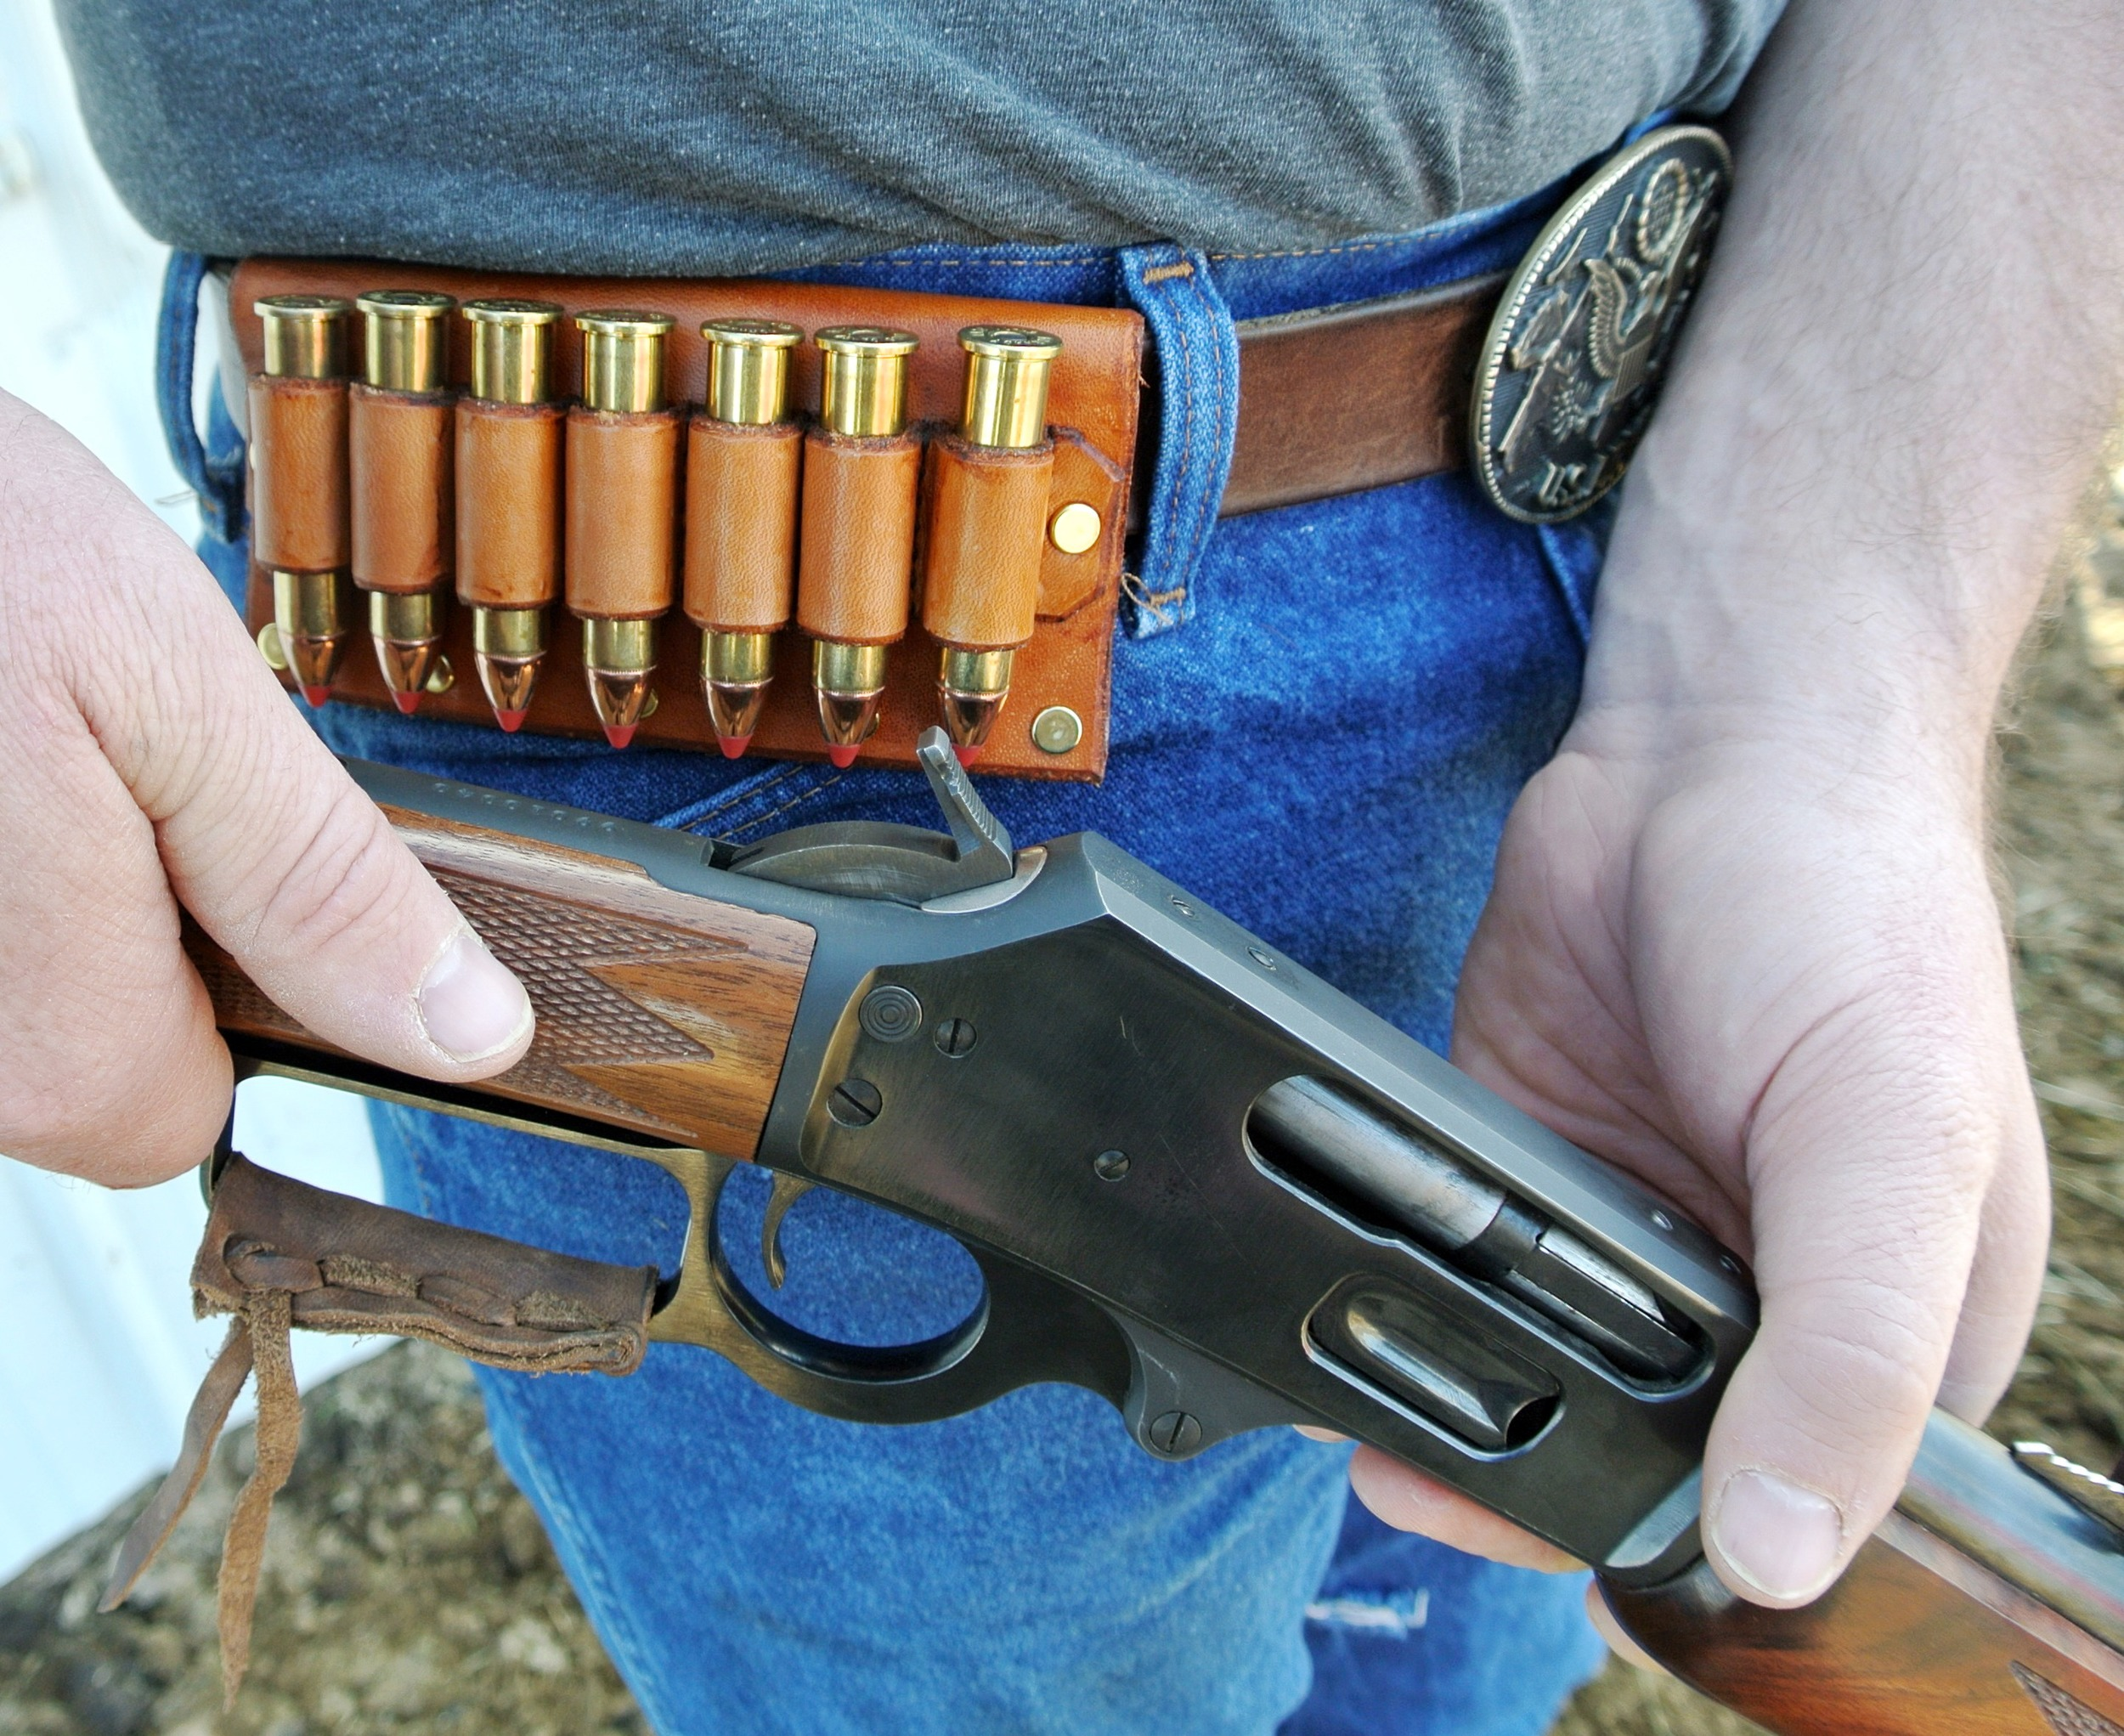 Leather Cartridge Holder for Belt!